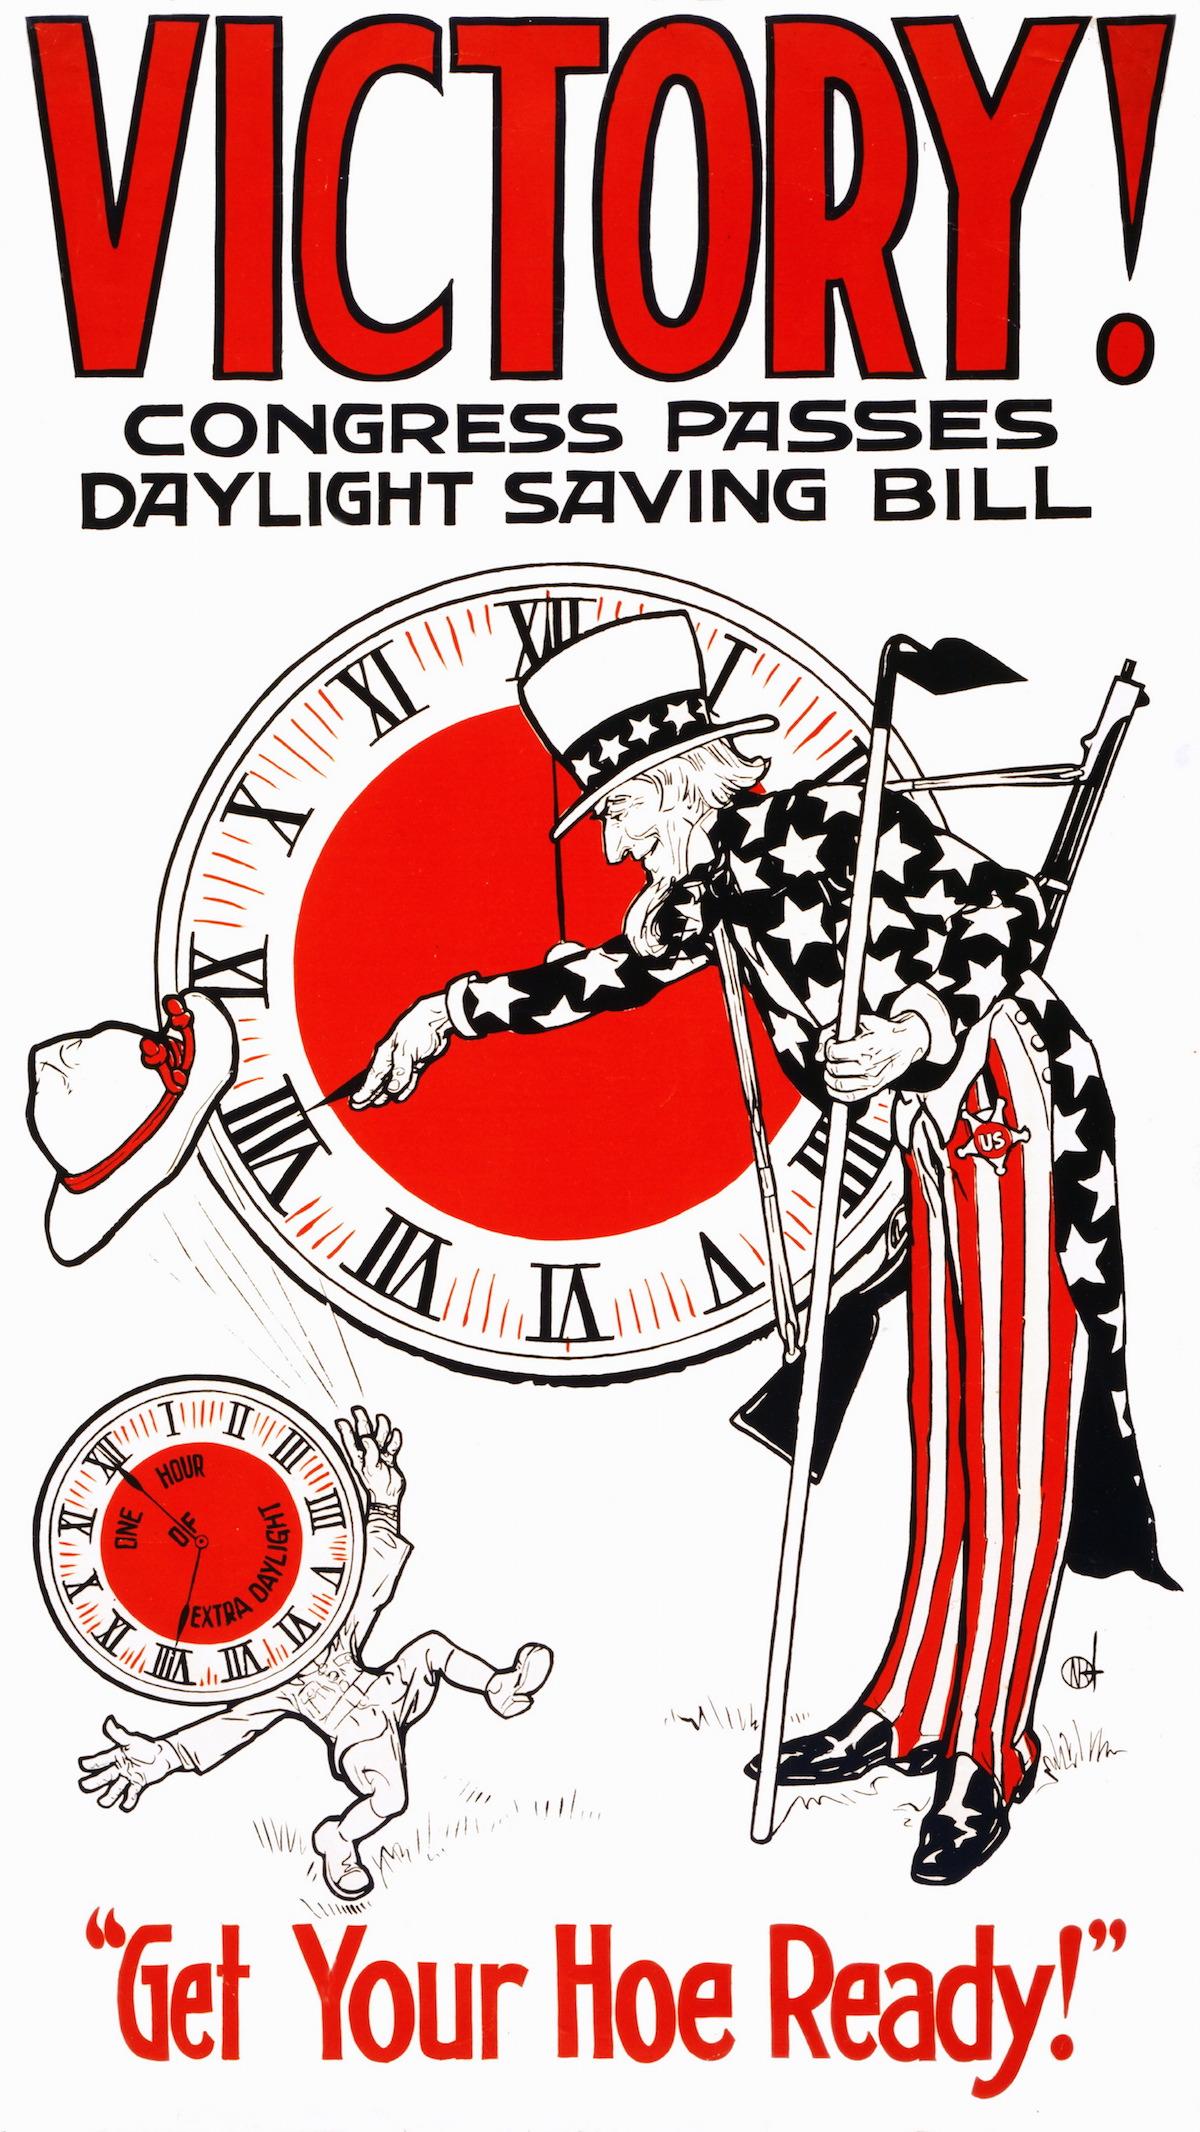 1917 poster celebrating Daylight Savings